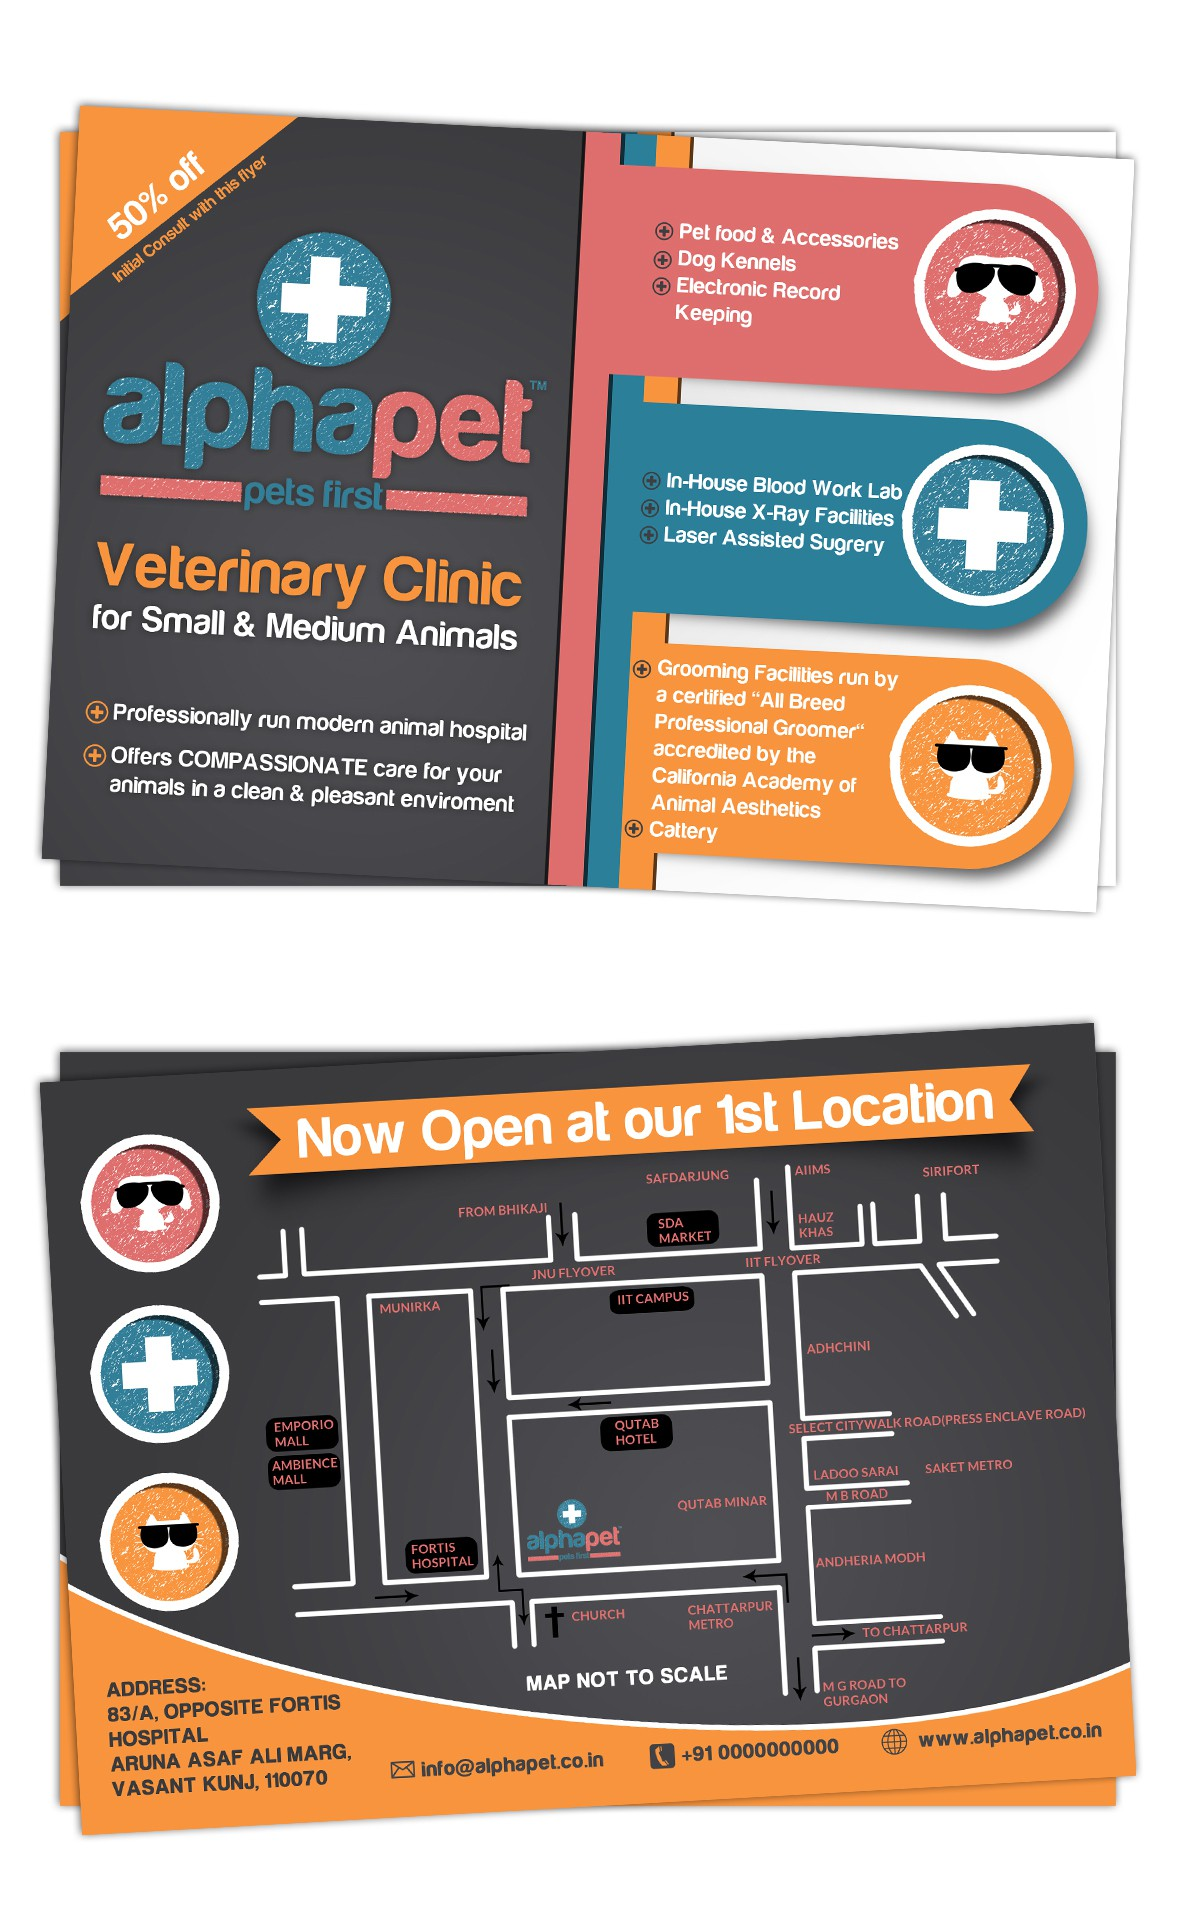 Create the next postcard or flyer for Alphapet